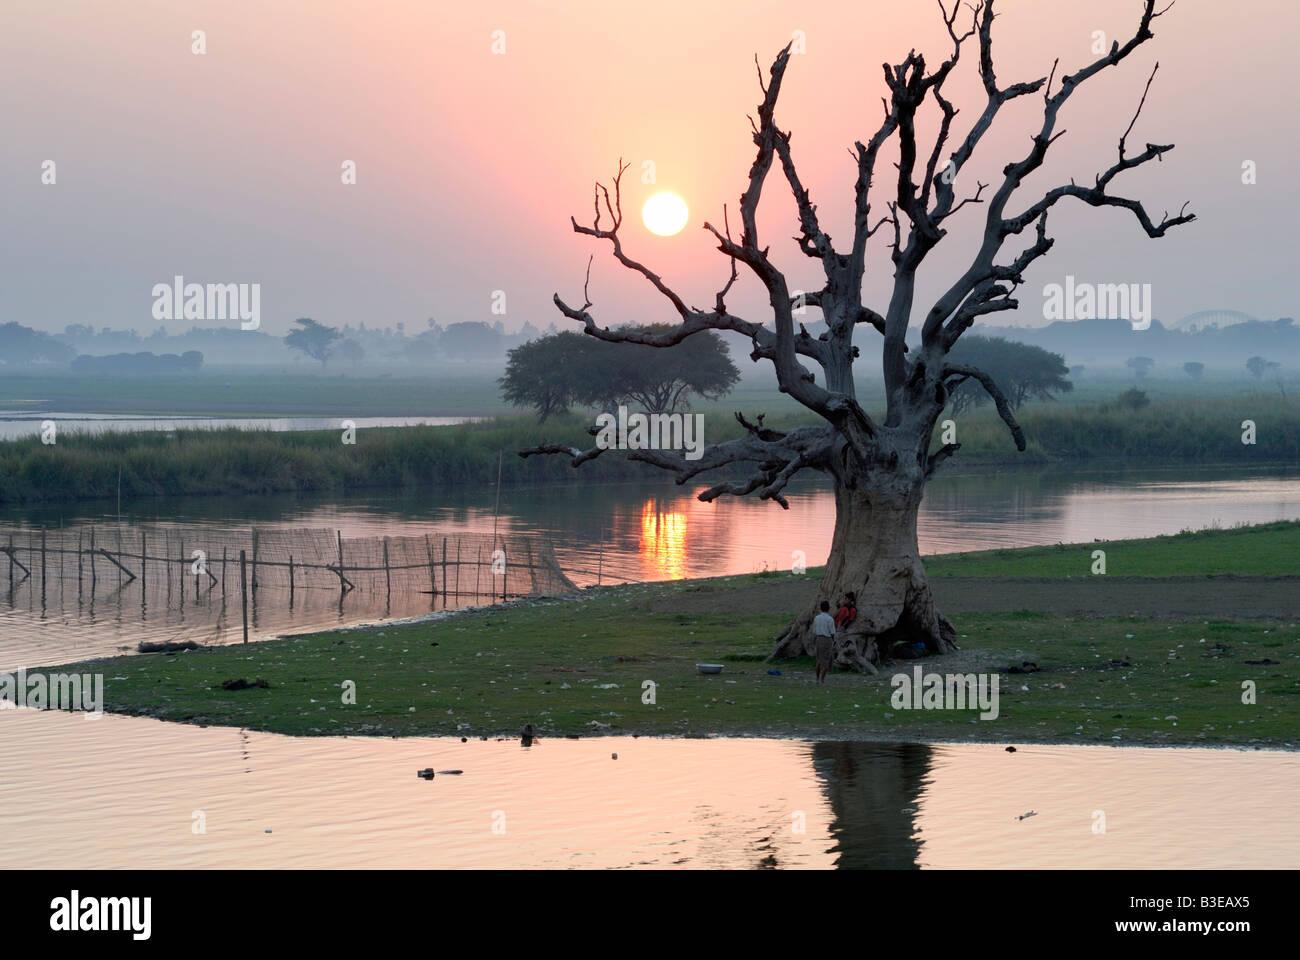 sunset view of Thaungthaman Lake, Amarapura, Myanmar (Burma) - Stock Image